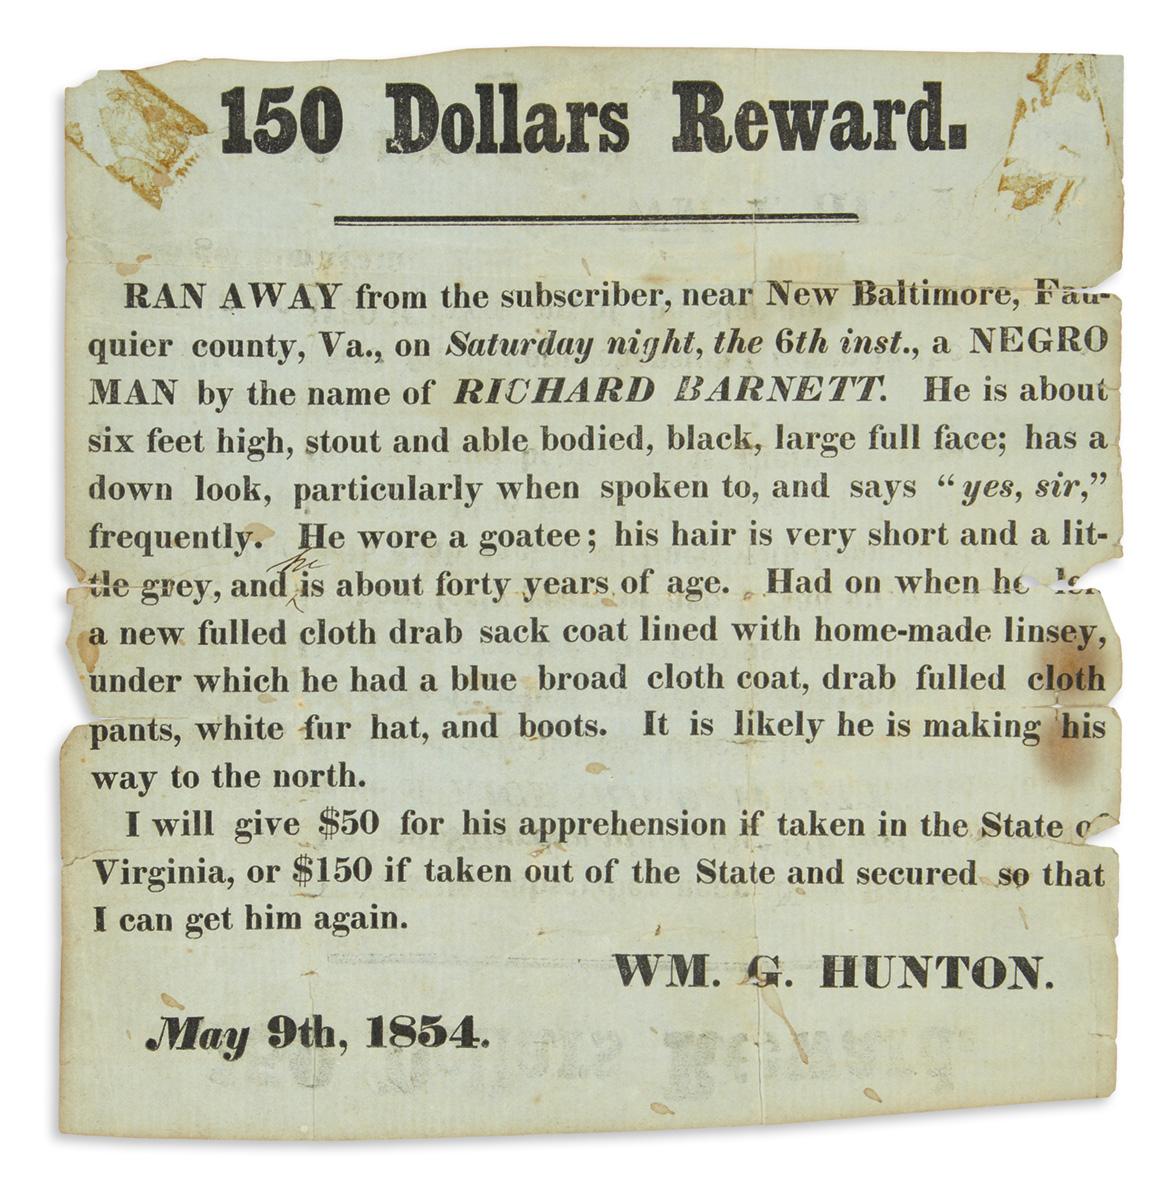 (SLAVERY AND ABOLITION.) Hunton, William G. 150 Dollars Reward. Ran Away . . . a Negro Man by the Name of Richard Barnett.